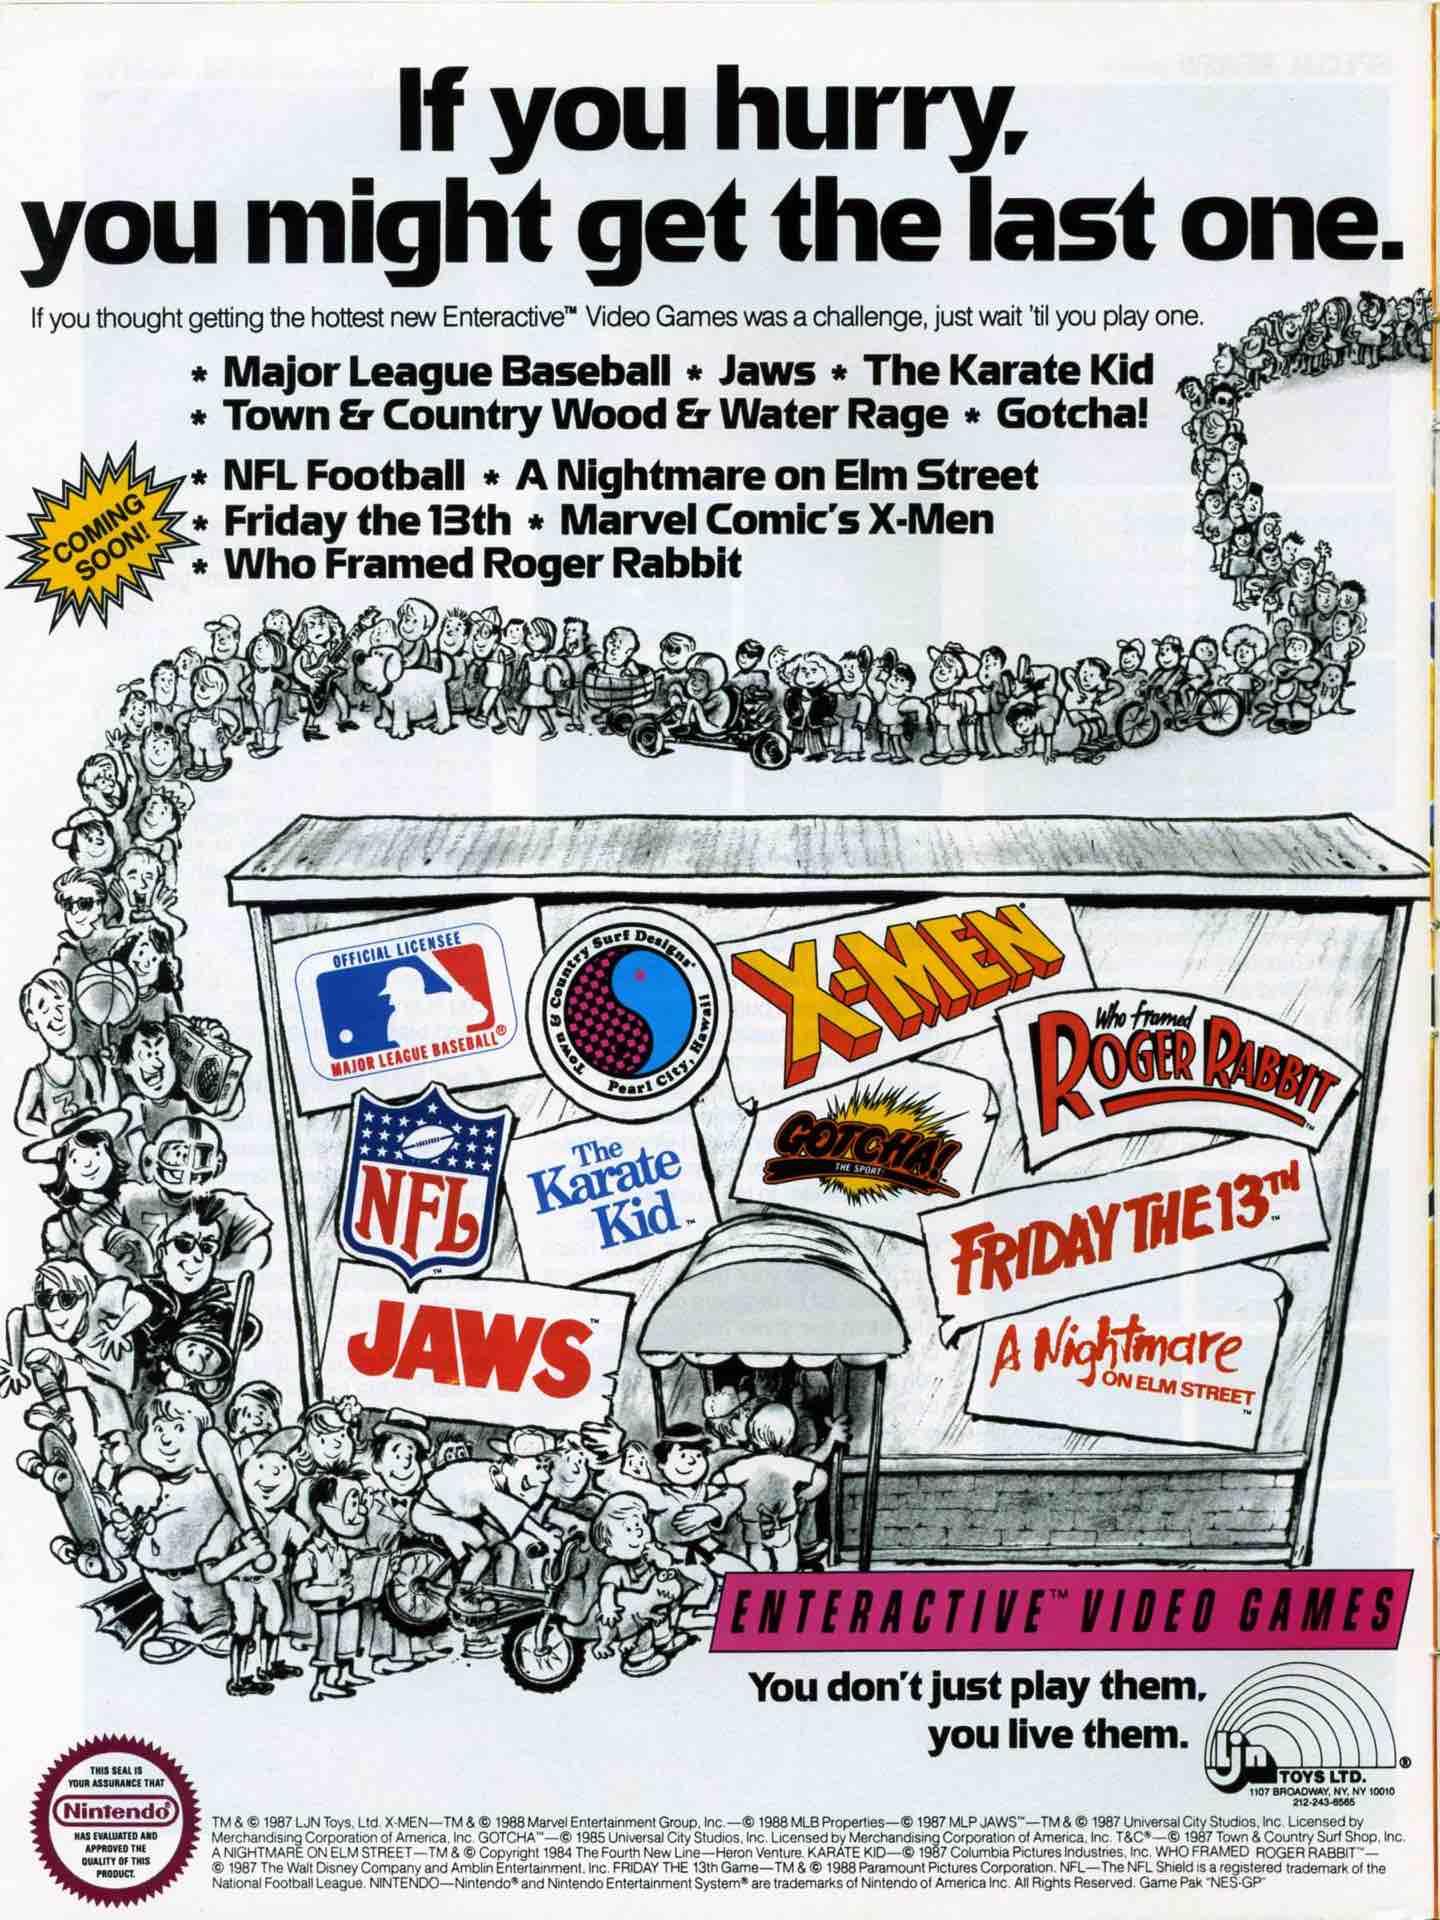 Nintendo Fun Club News | June-July 1988 pg 10